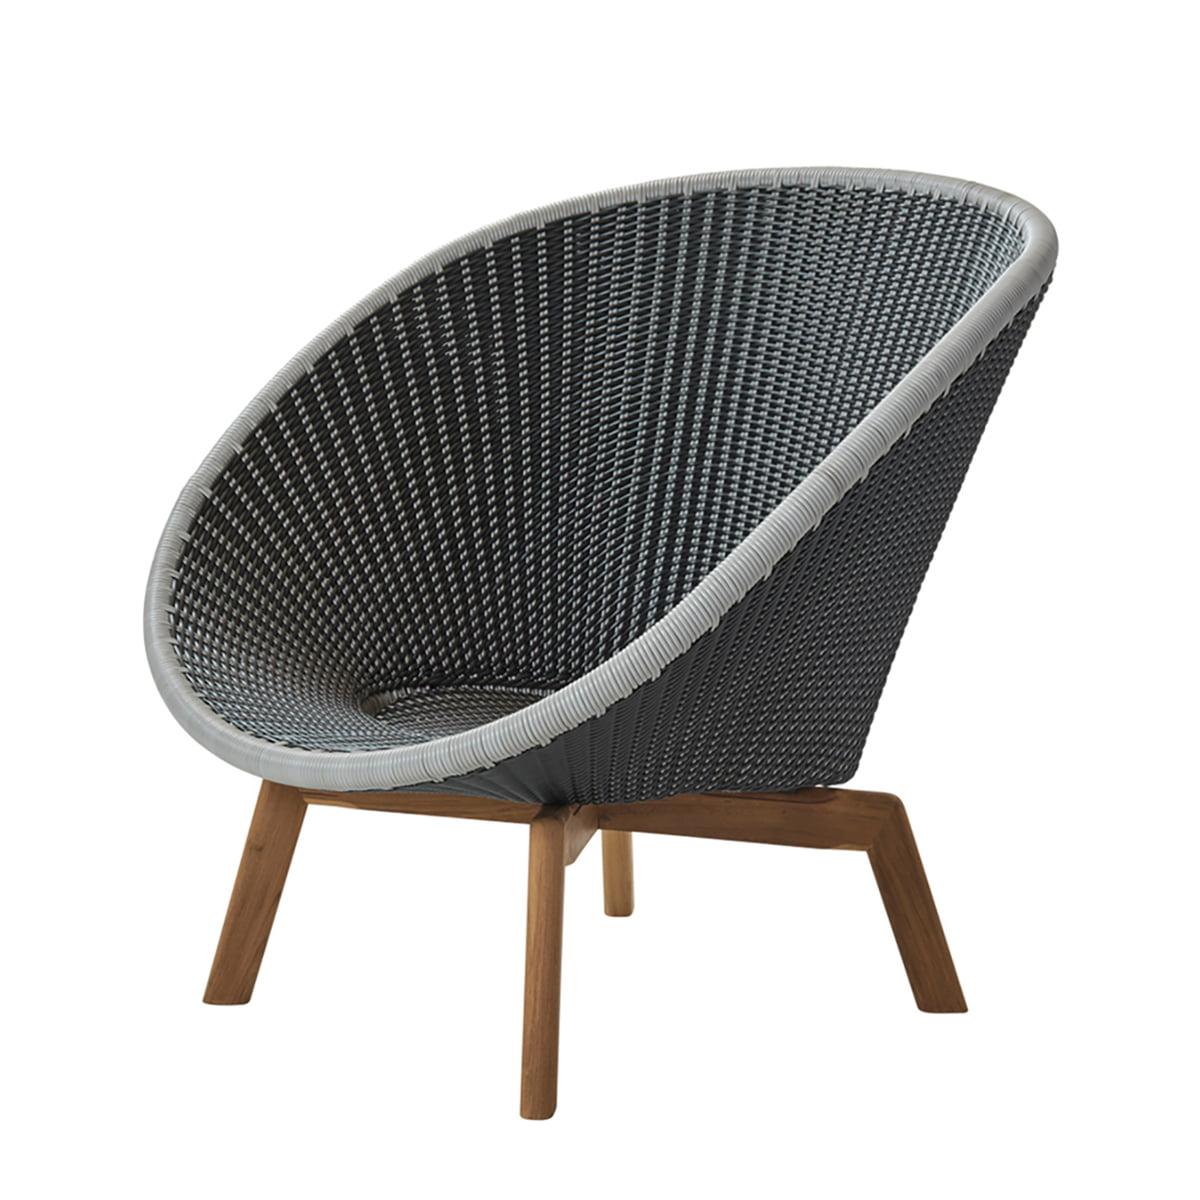 Cane-line - Peacock Lounge Sessel (5458), Teak / grau / hellgrau